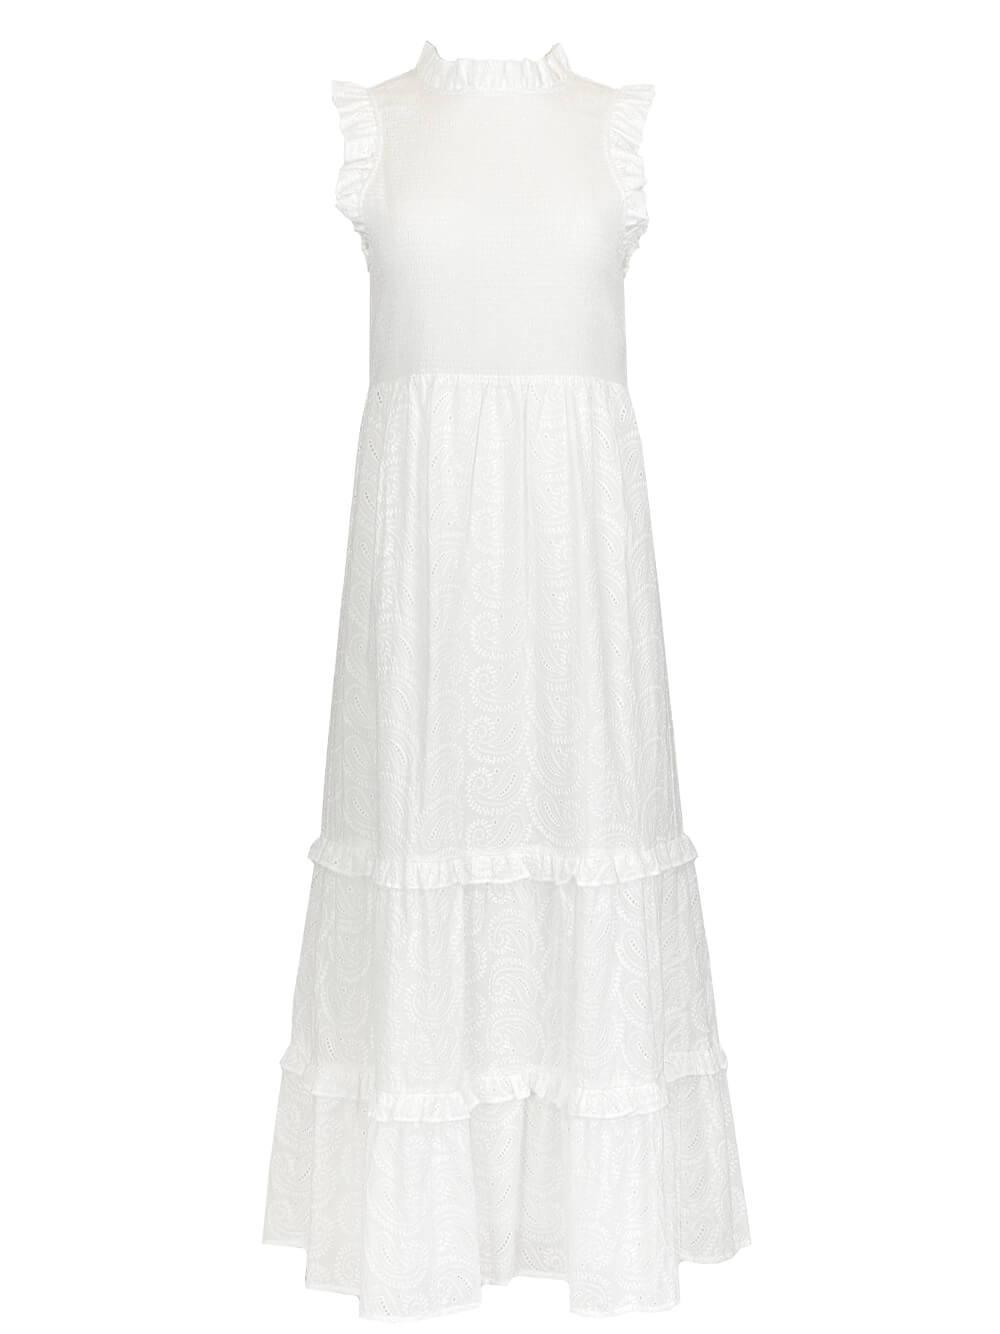 Quinnlyn Eyelet Maxi Dress